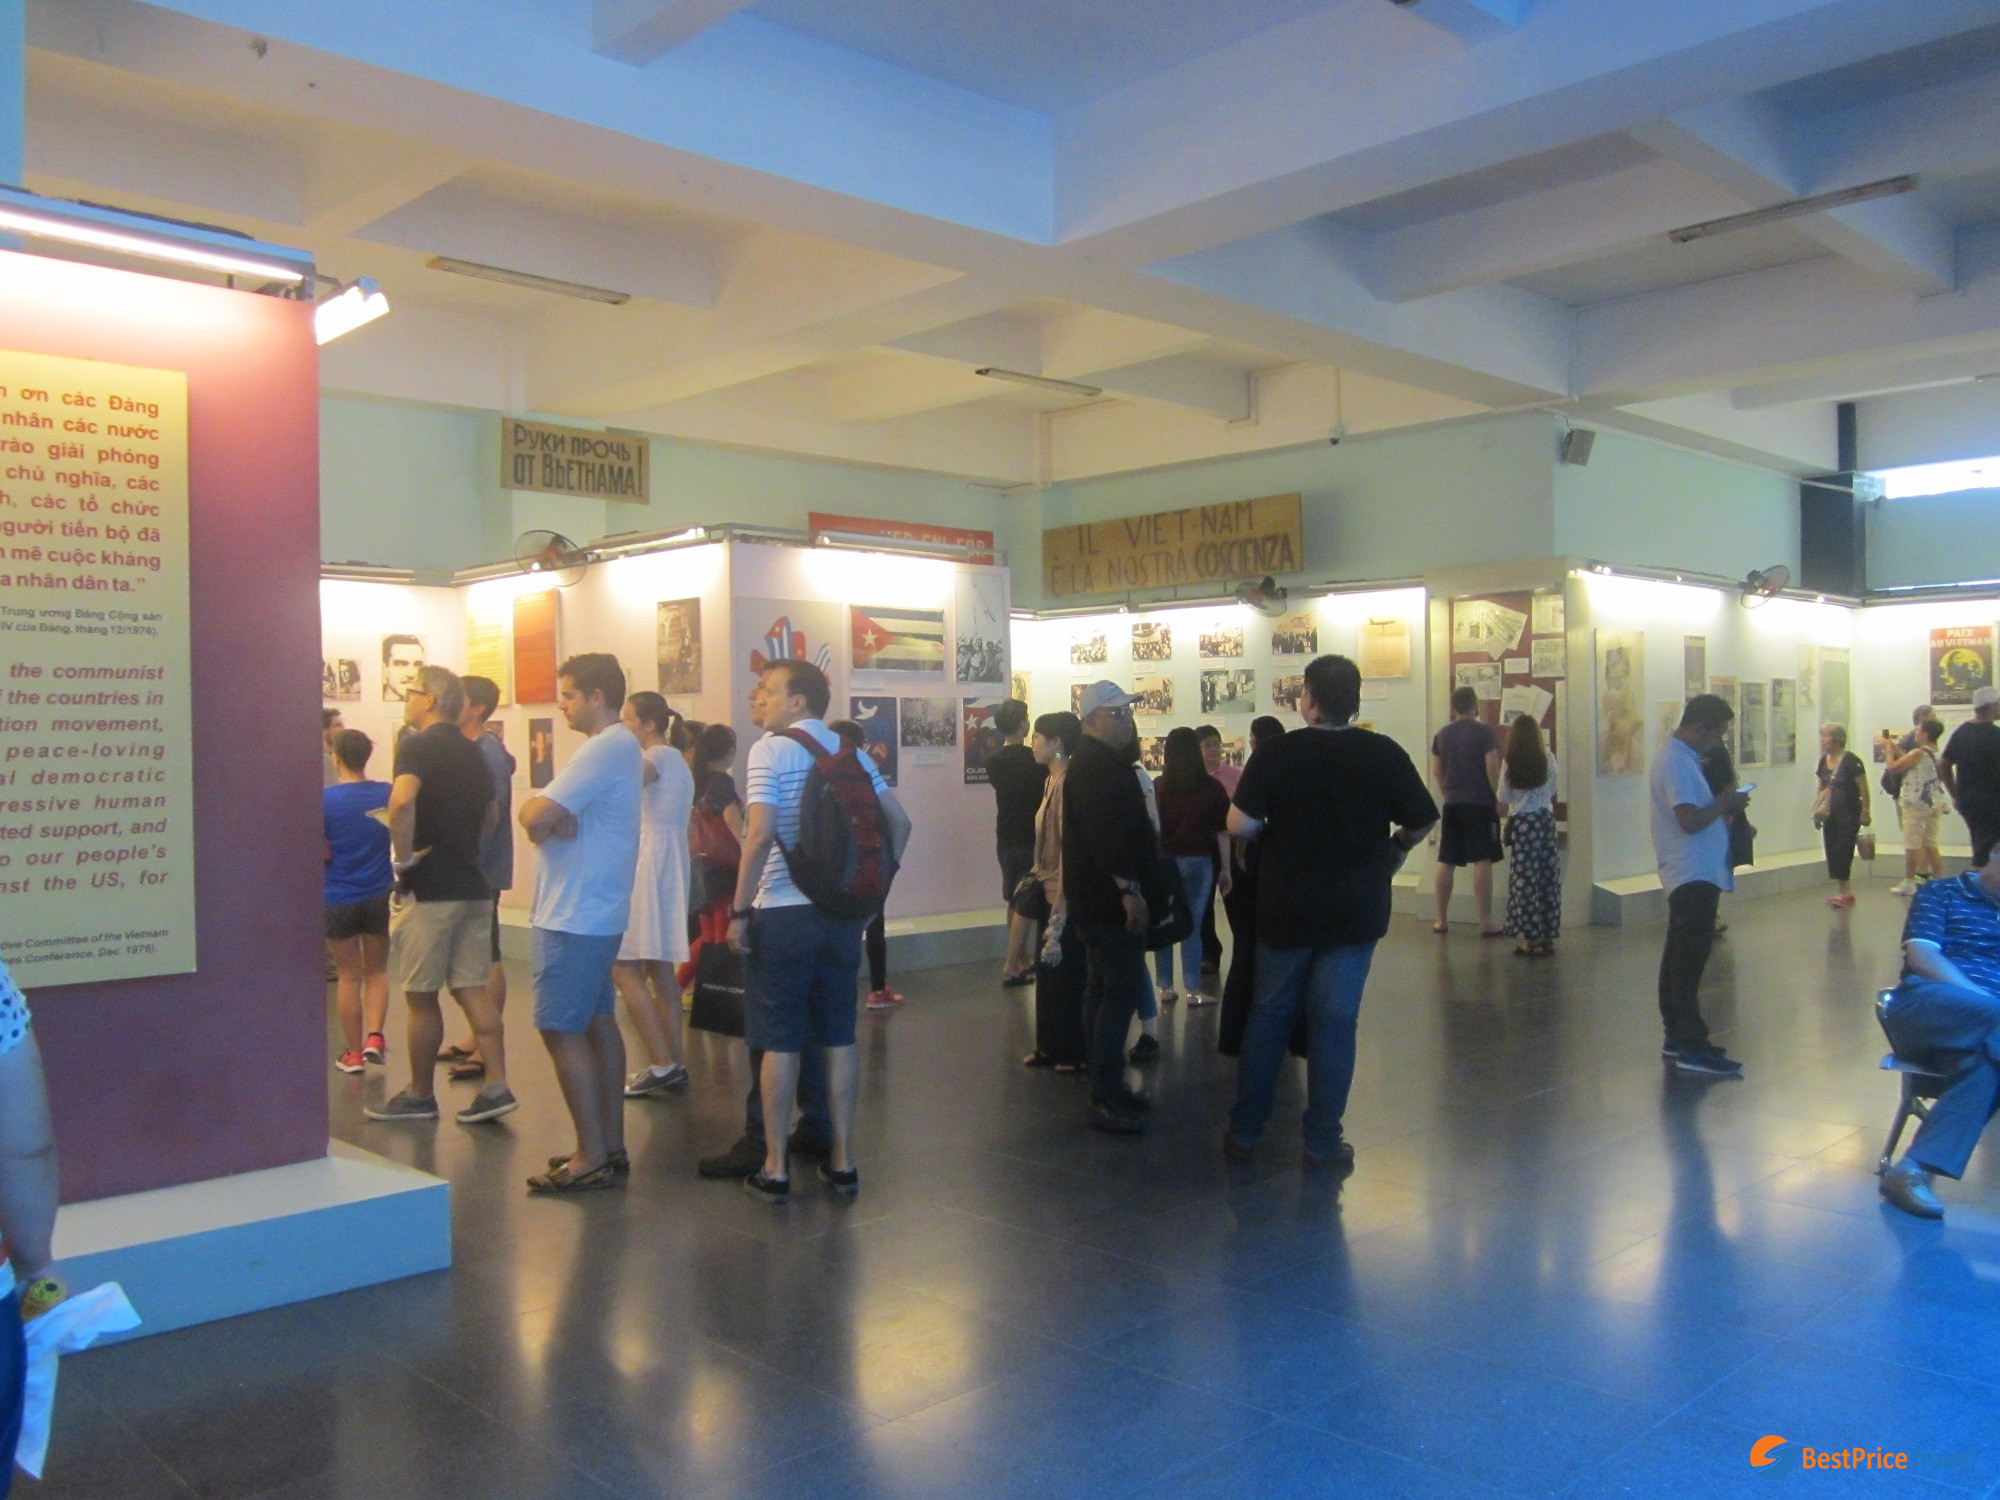 Inside the War Remnants Museum